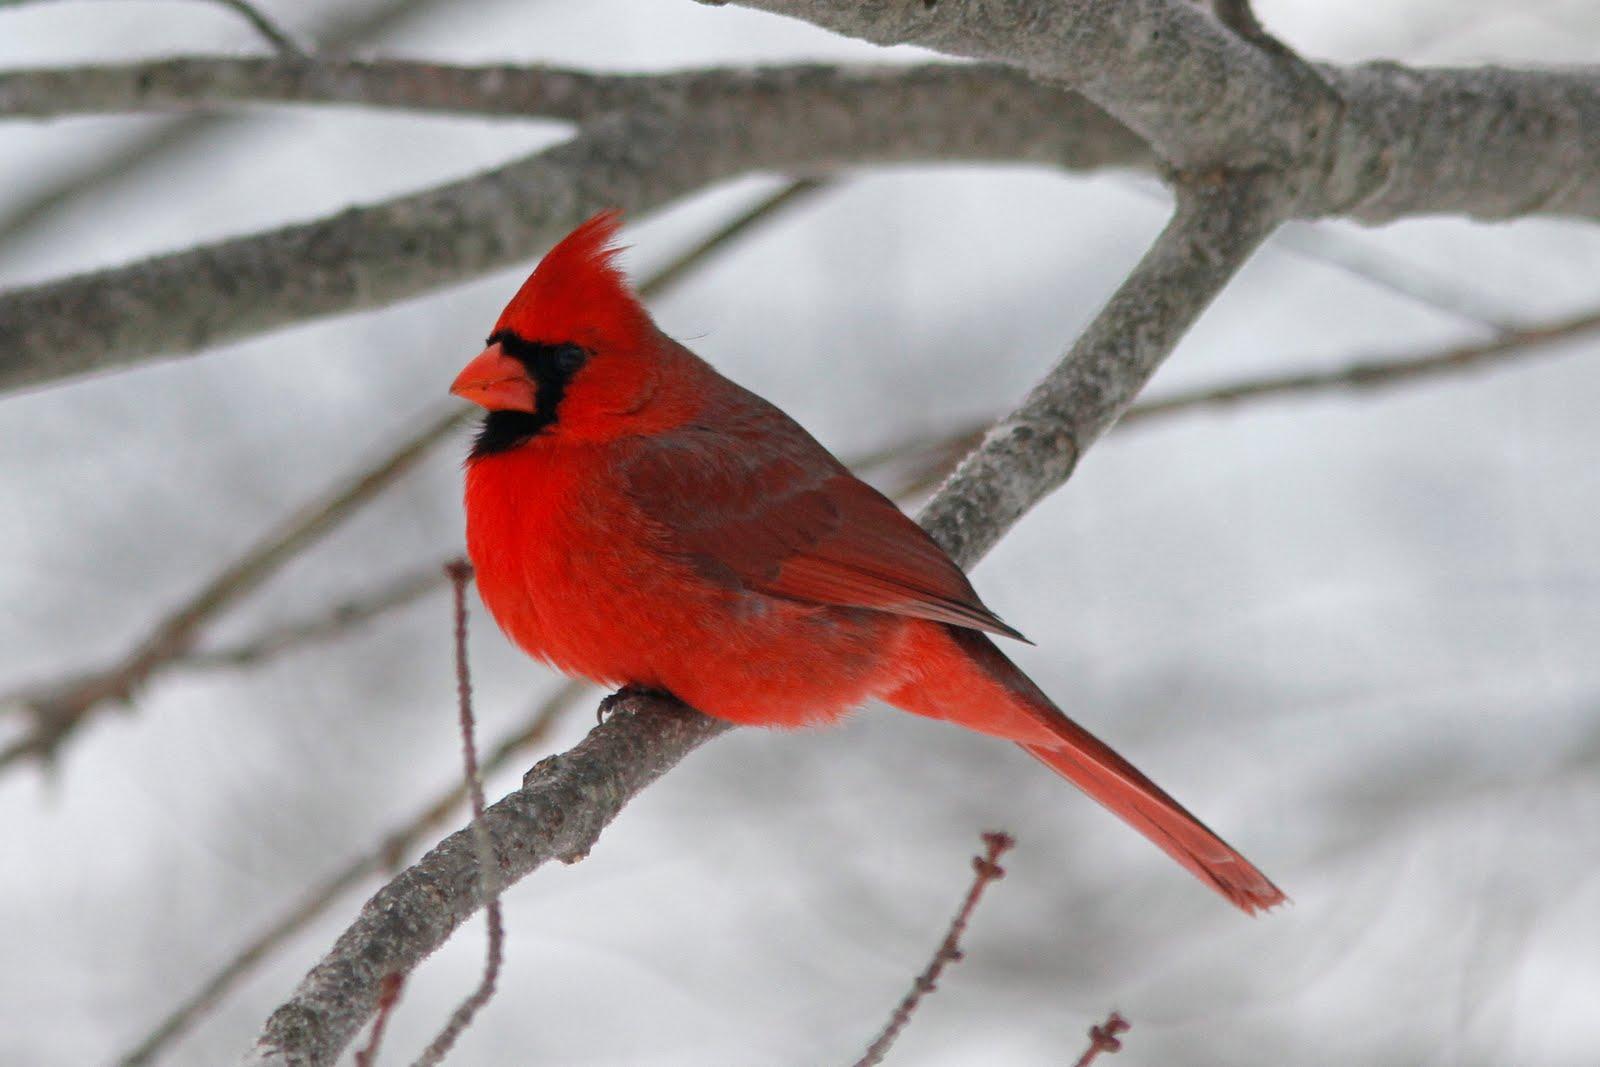 Quabbin birding and beyond Winter birds at Covey WMA